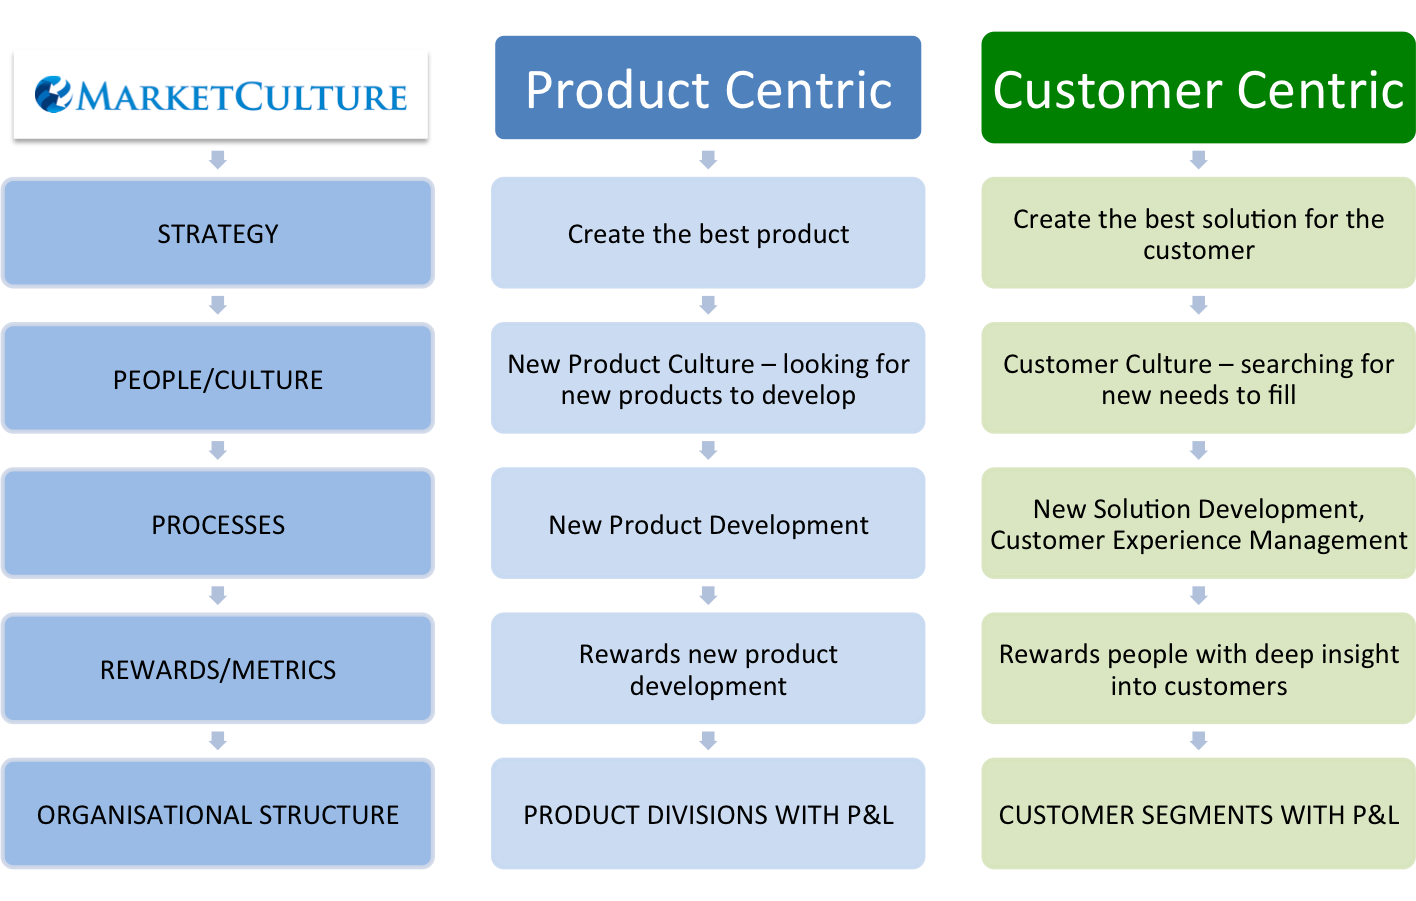 product-versus-customer-centric-companies